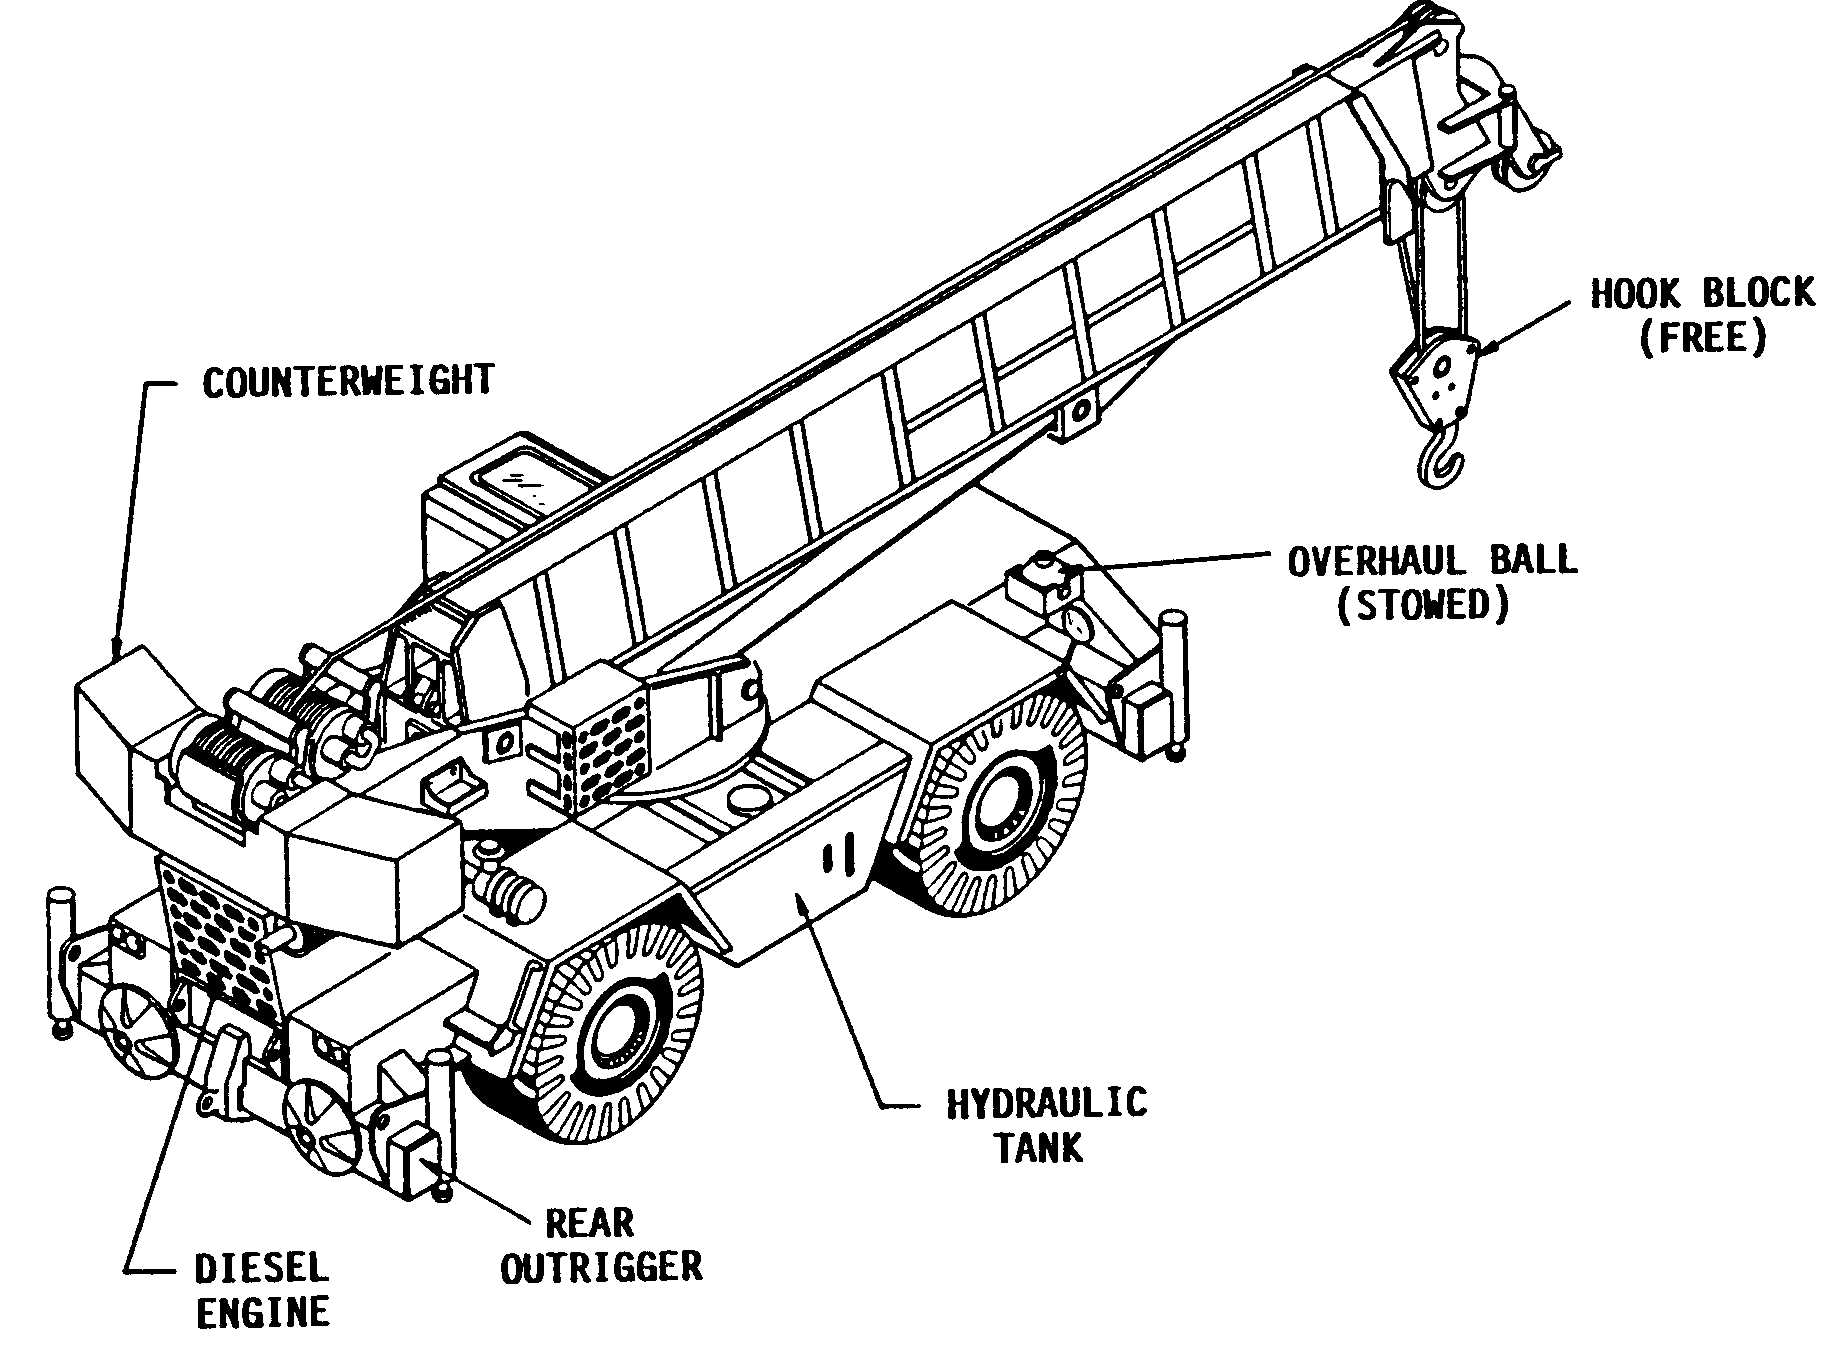 TM-5-3810-306-20_18_0 Polaris Xpedition Wiring Diagram on ranger xp 900, ranger electric plow, rzr warn winch, rear winch, sound bar,